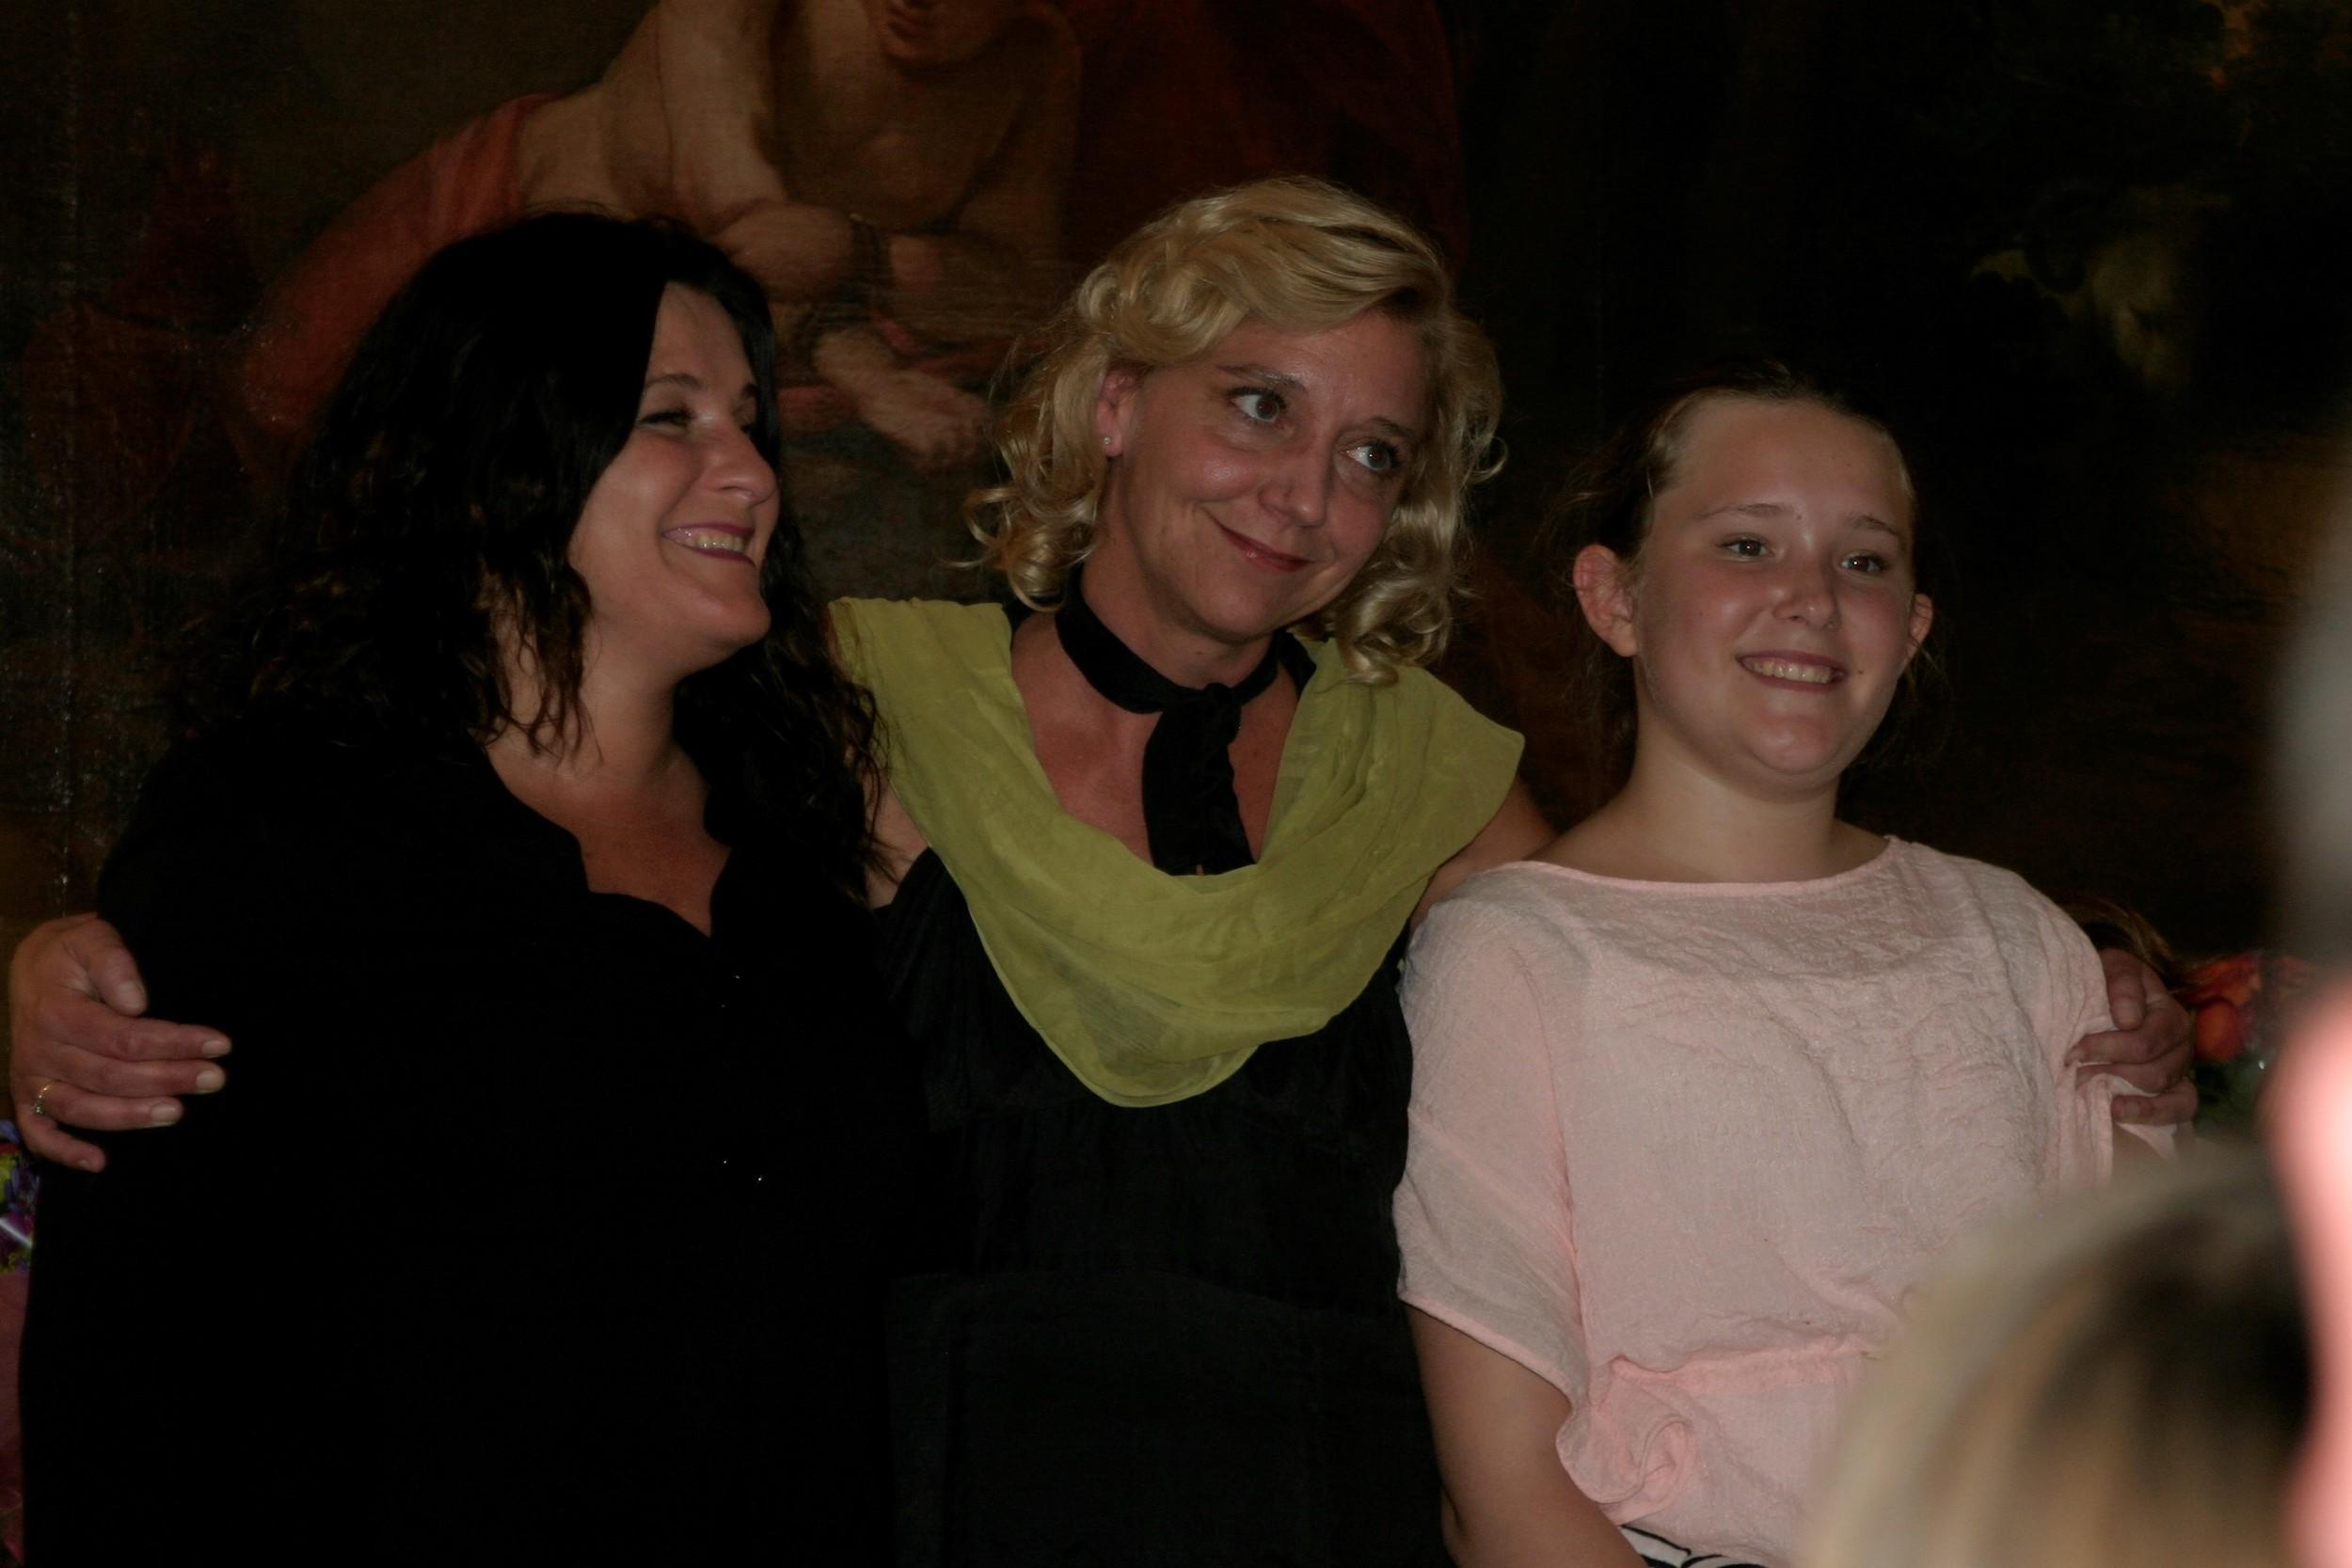 Edelfeldt-pigerne: Skønne støtter